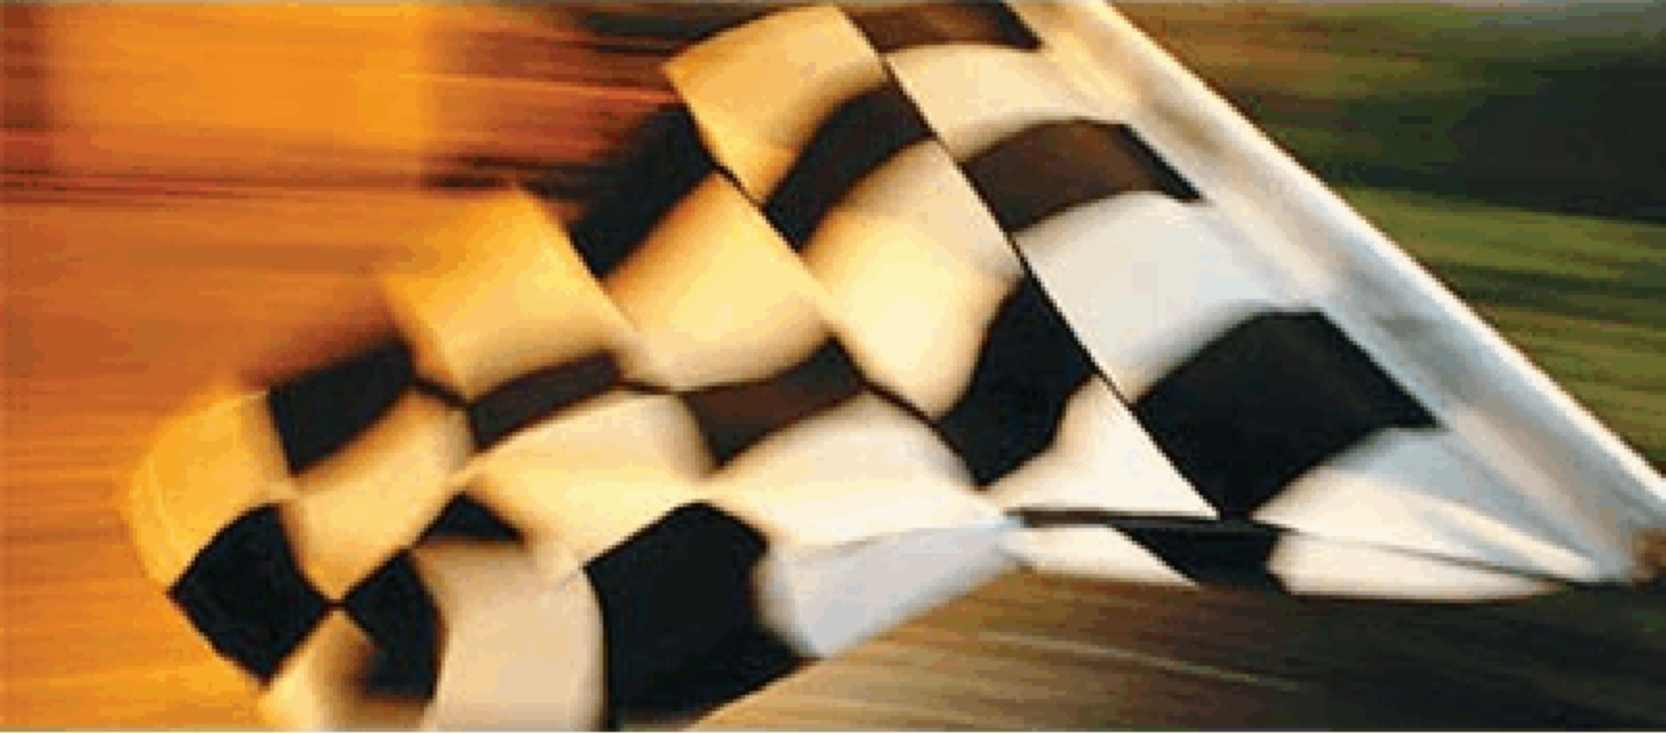 Nascar Checkered Flag Prepasted Wall Border Roll: [48+] Racing Checkered Flag Wallpaper Borders On